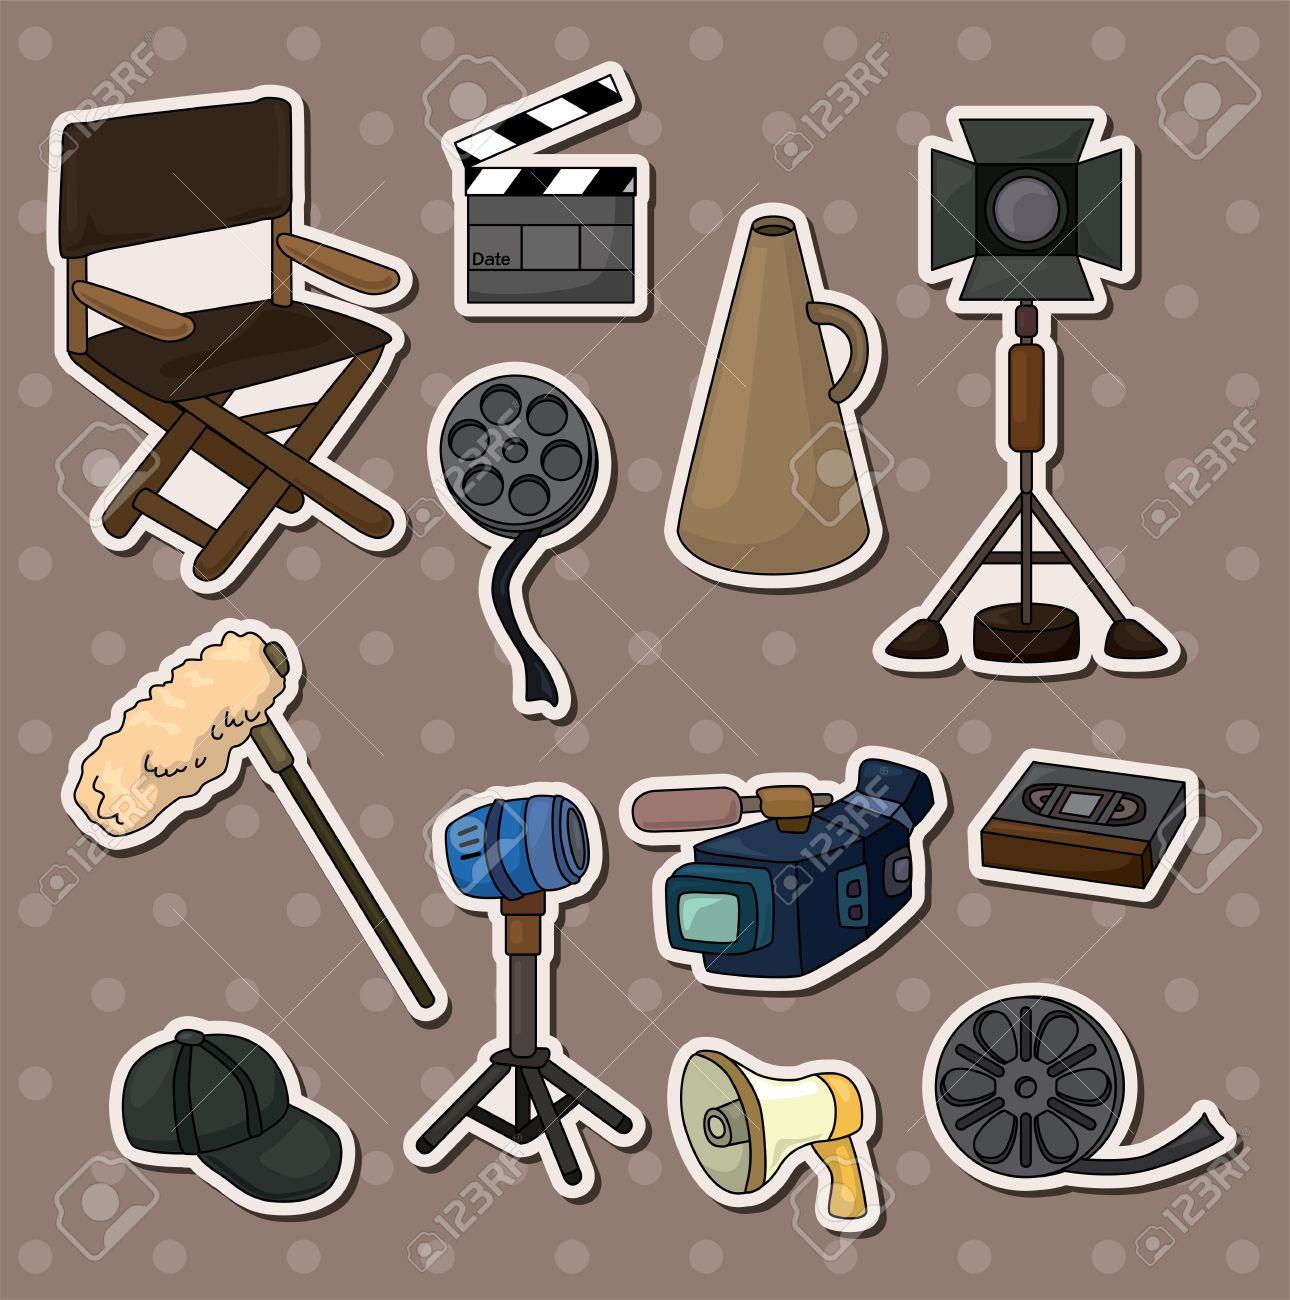 movie tool stickers Stock Vector - 13706287